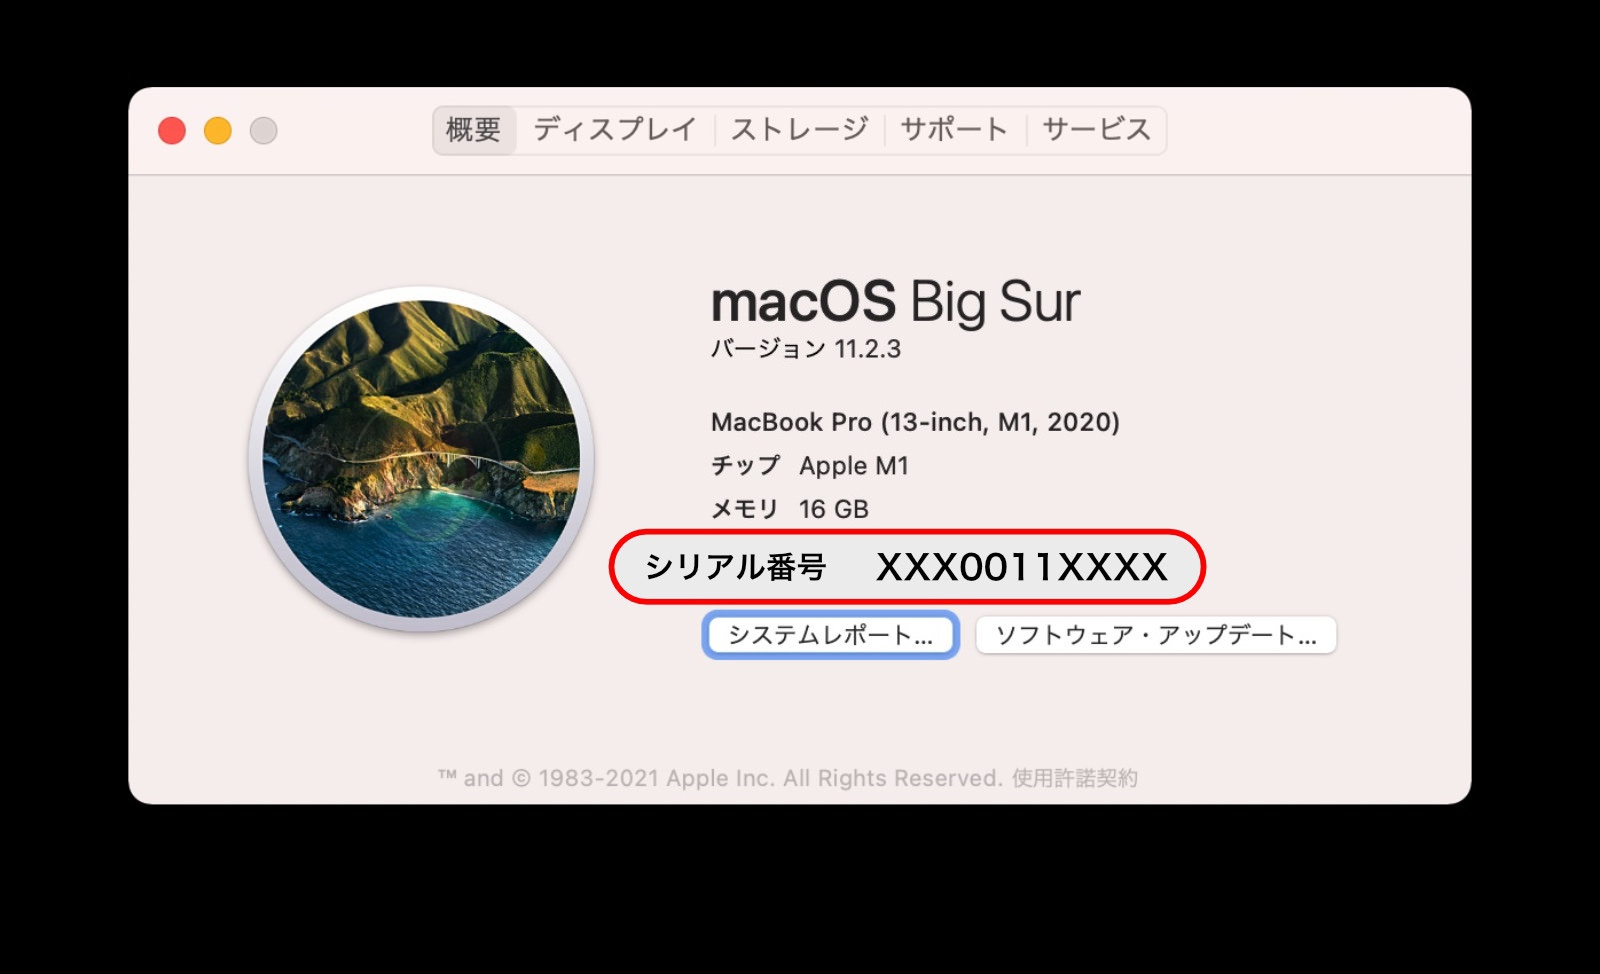 MacOS Big Sur System Information